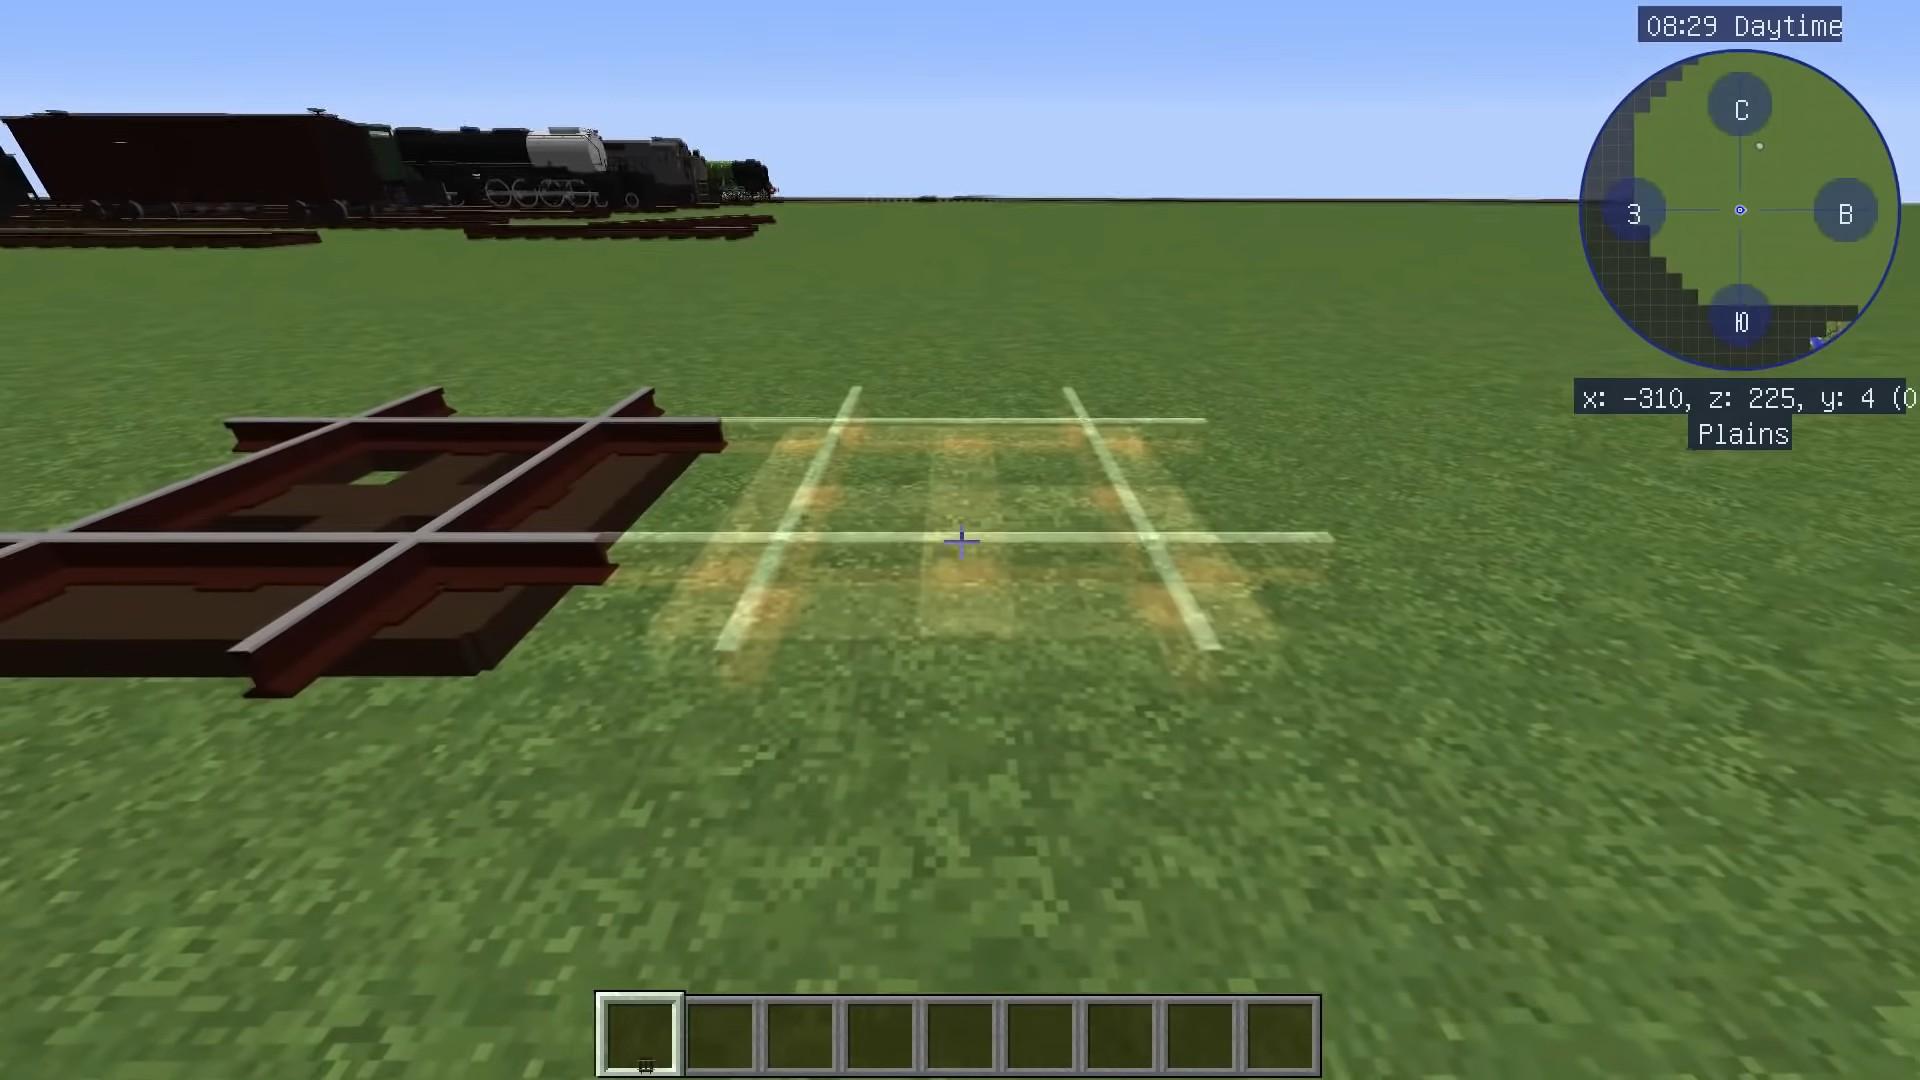 Мод Immersive Railroading - скриншот 6